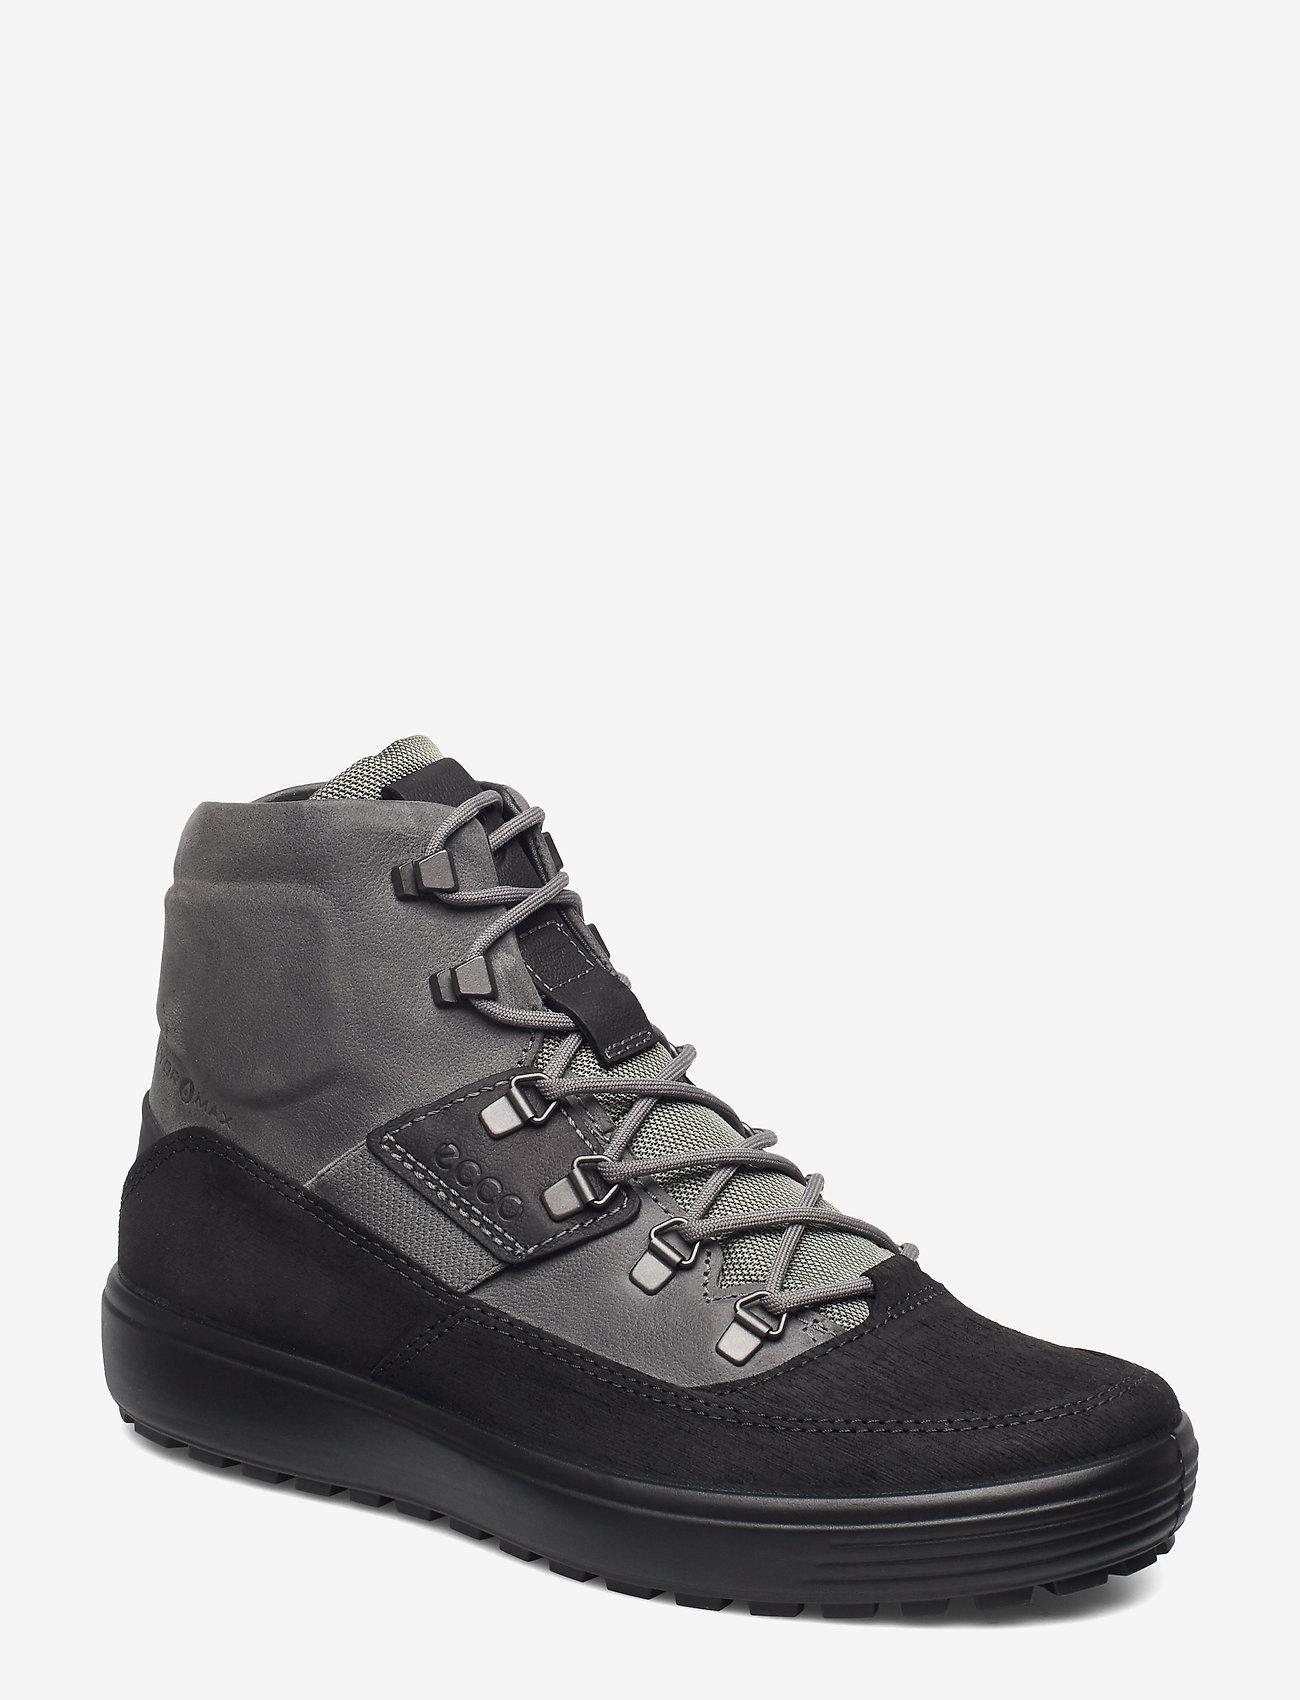 ECCO - SOFT 7 TRED M - laced boots - black/titanium - 0